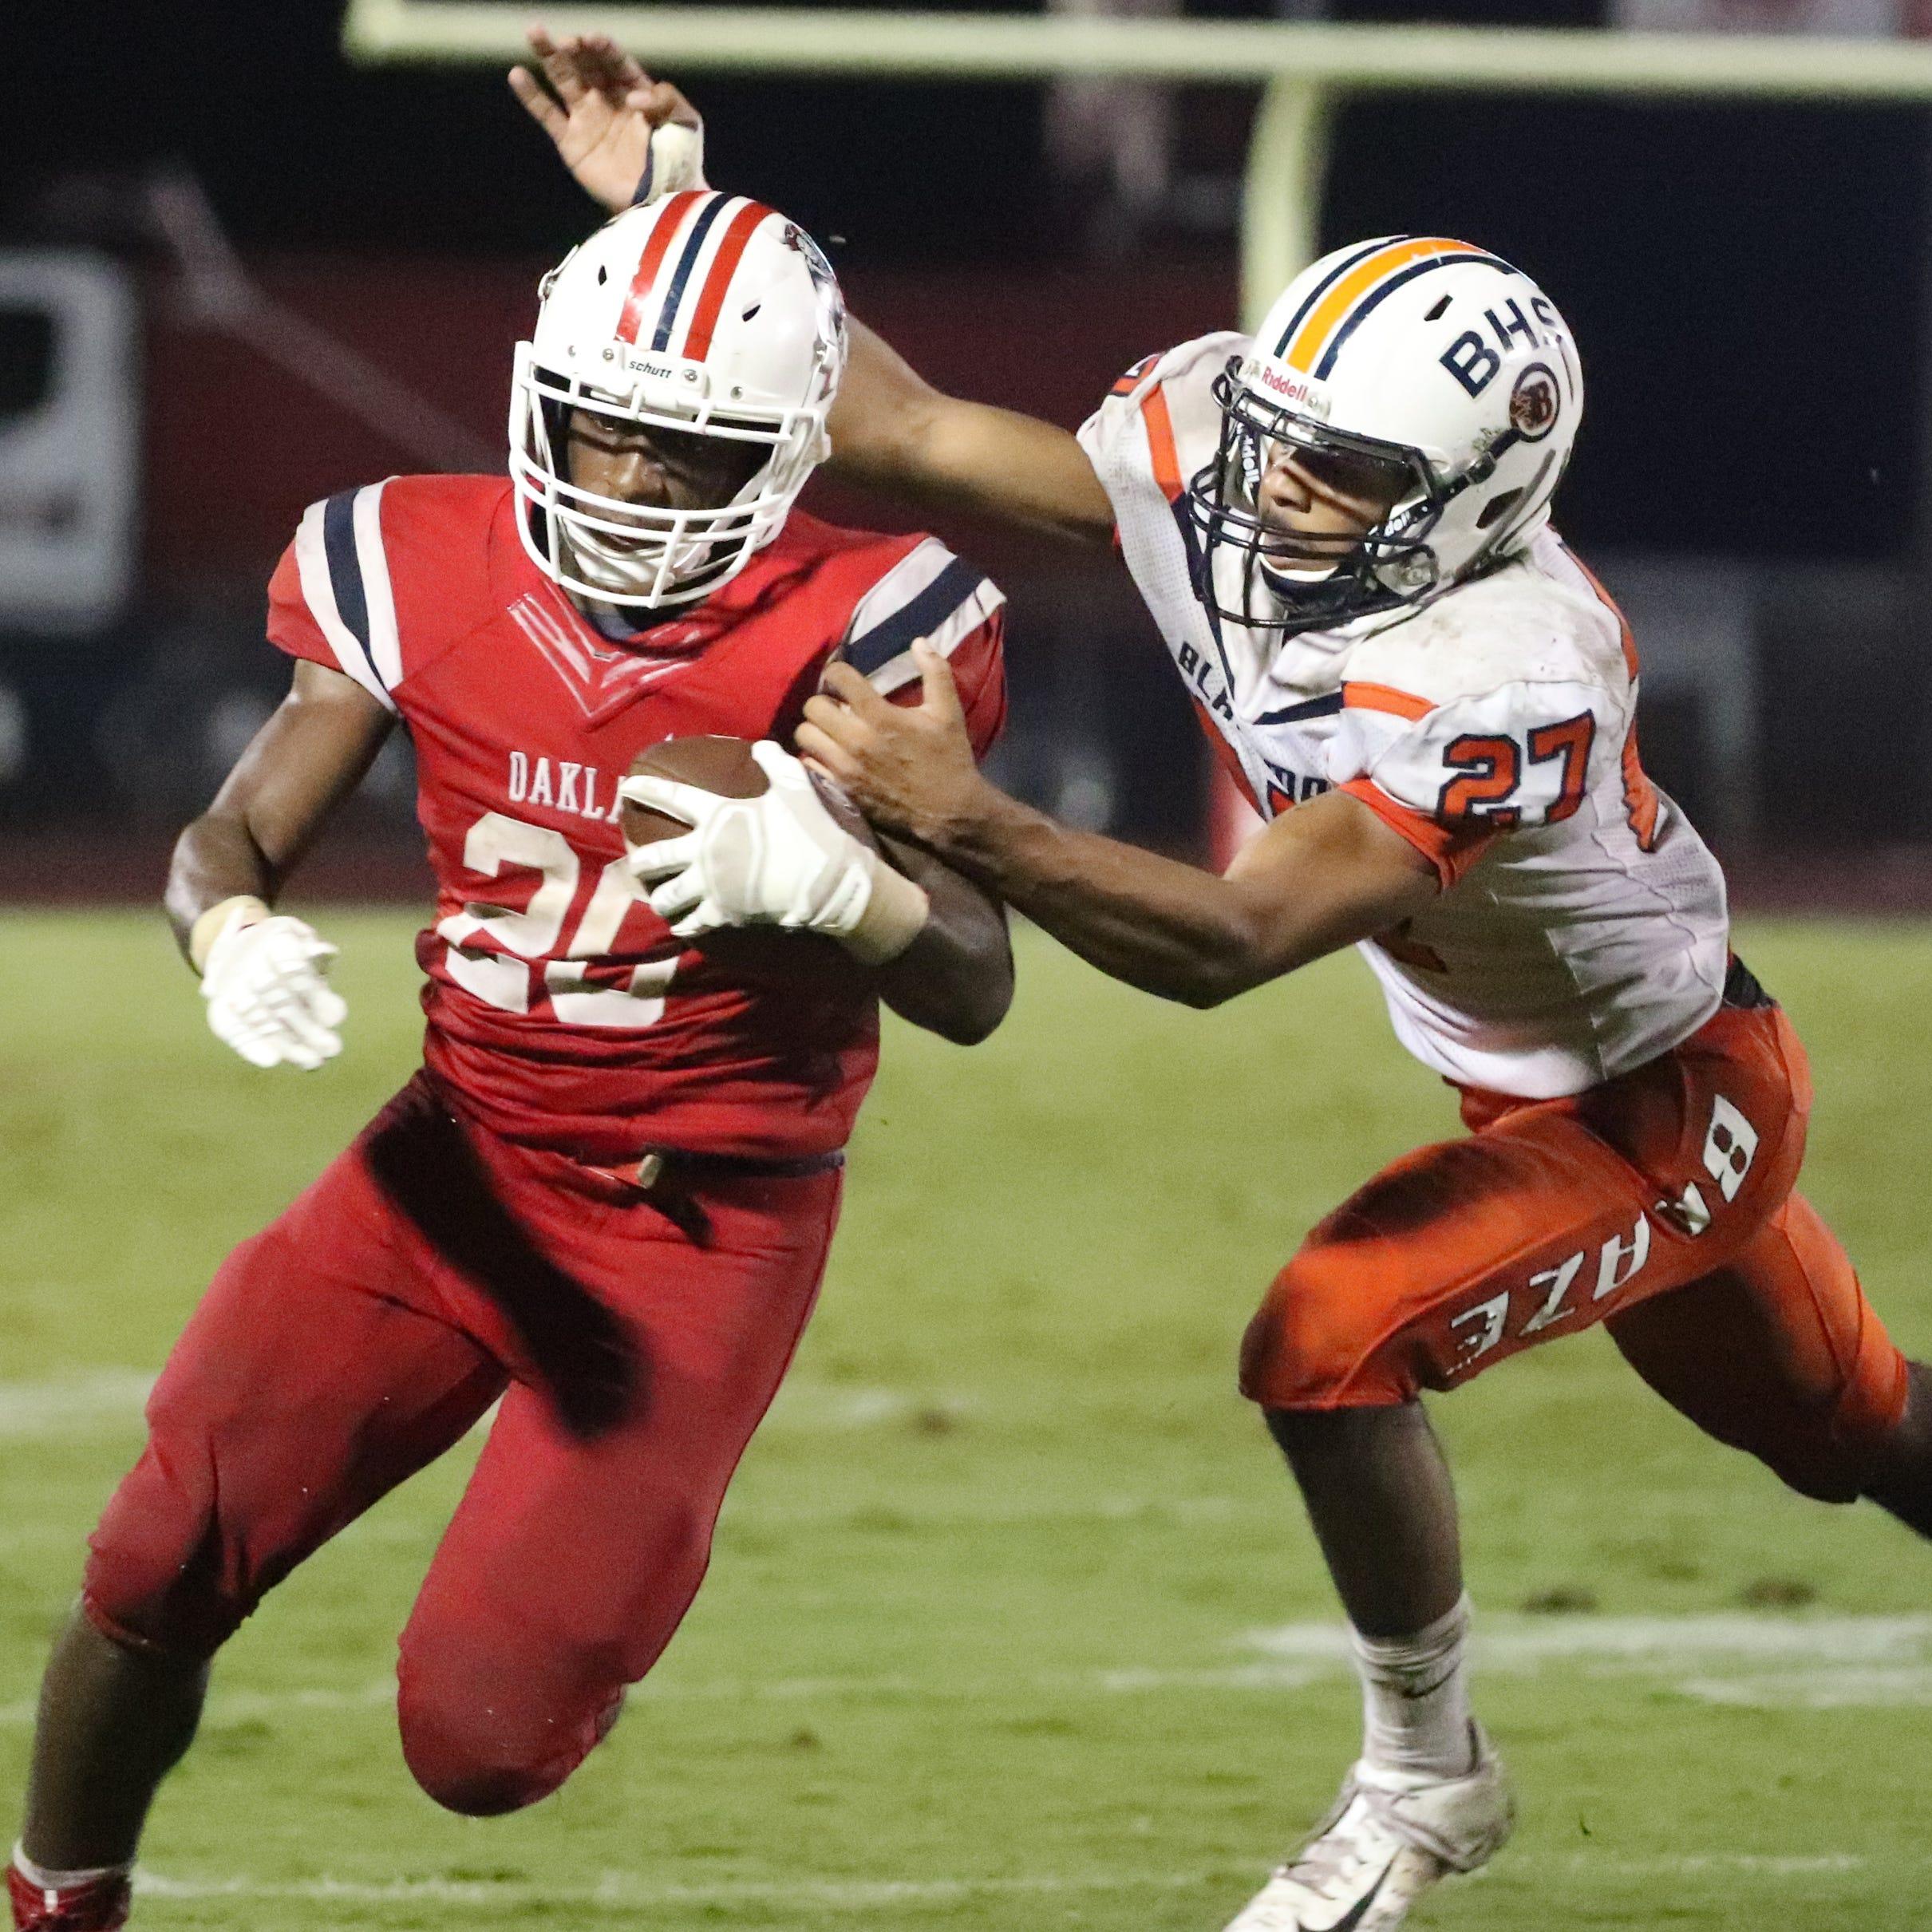 Friday's Murfreesboro area high school football top performers